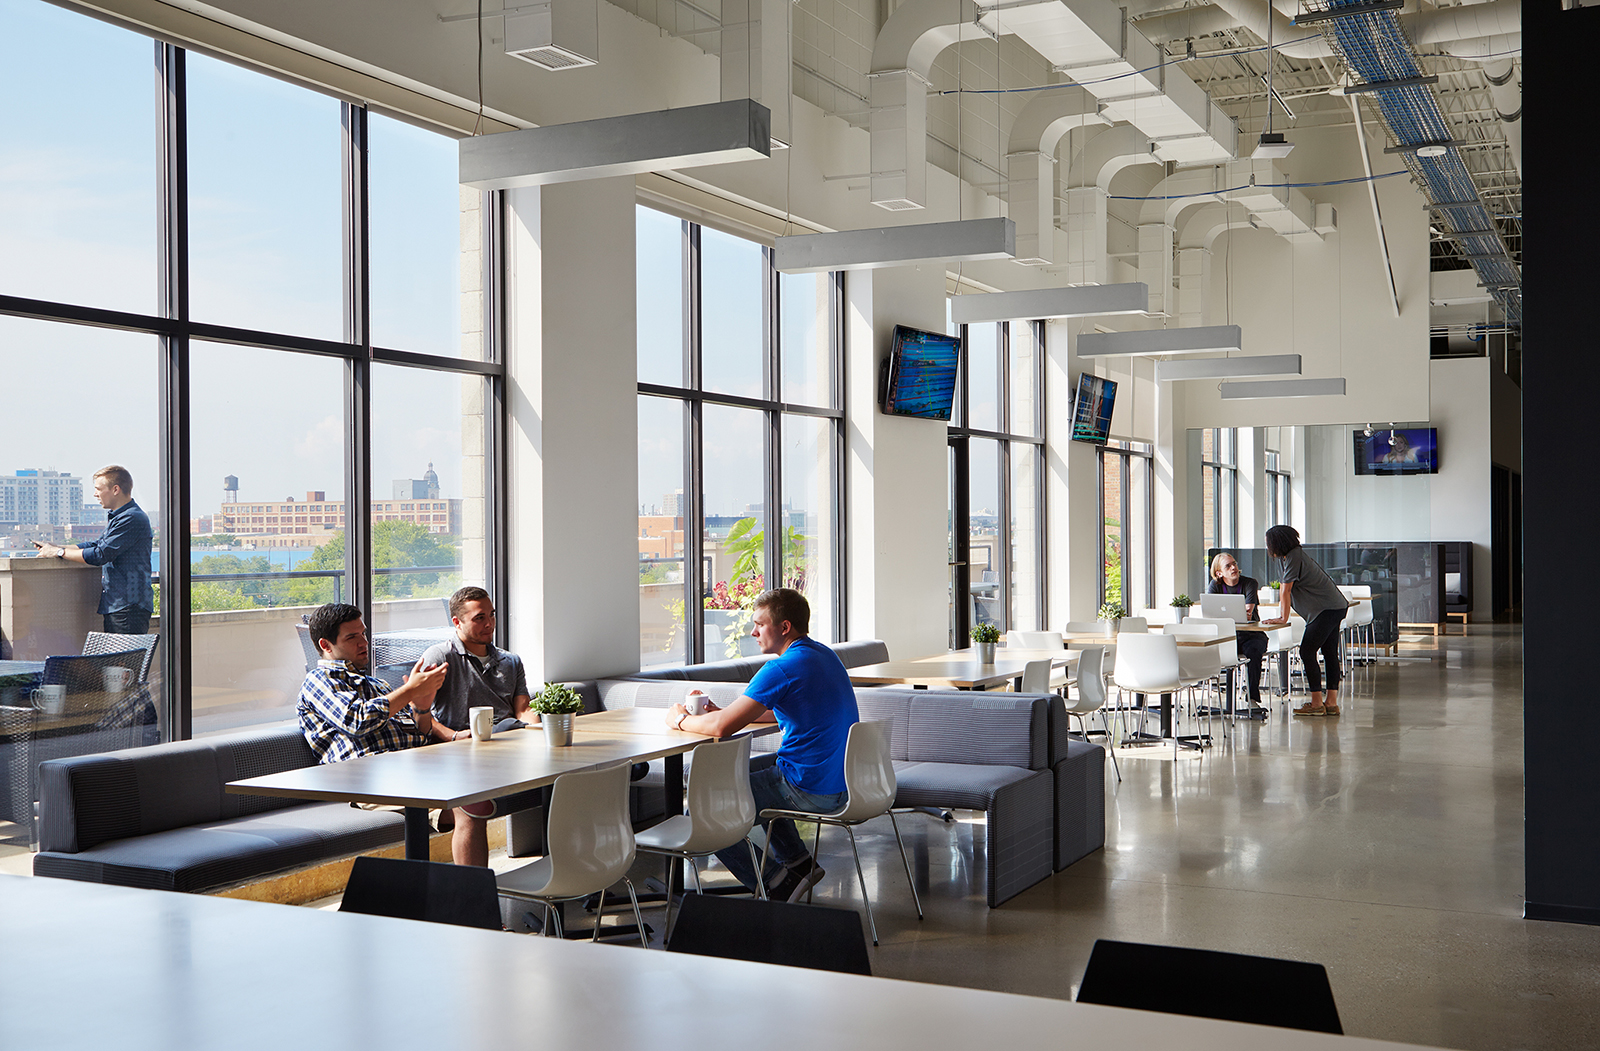 A look inside ncsa s new sleek chicago office officelovin 39 - Top interior design firms chicago ...